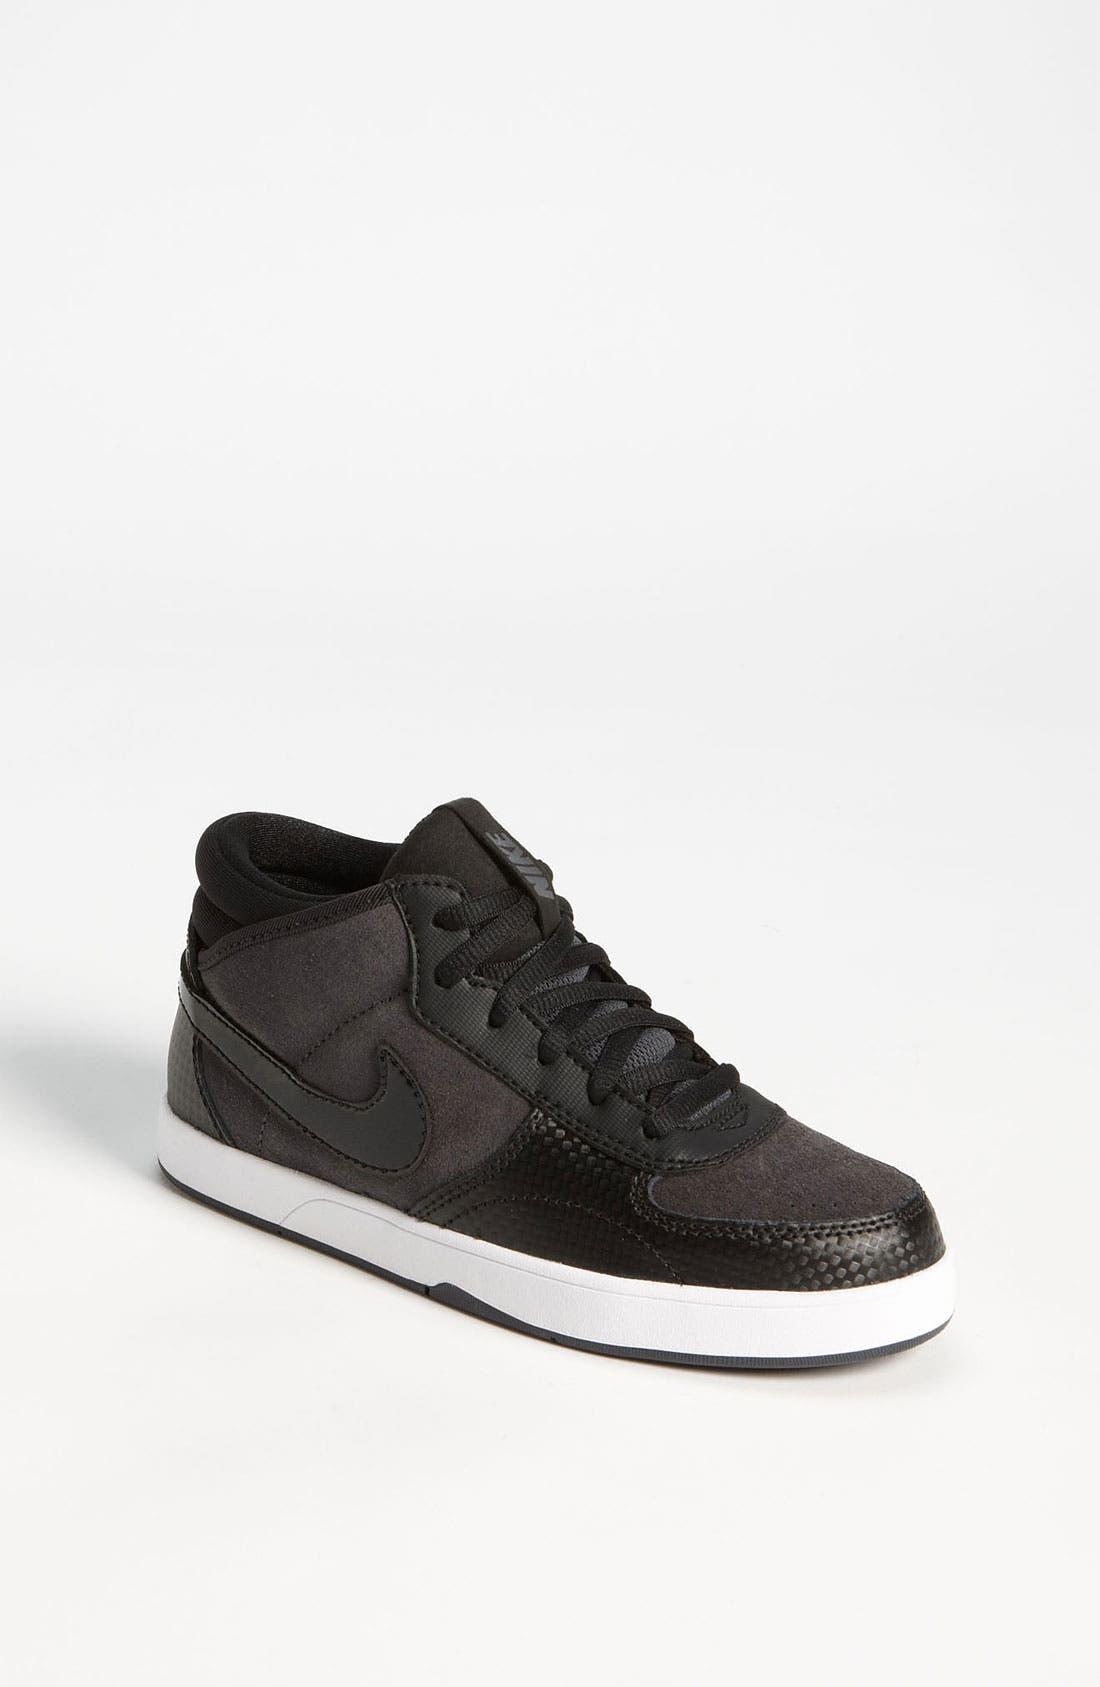 Alternate Image 1 Selected - Nike 'Mavrk Mid 3' Sneaker (Big Kid)